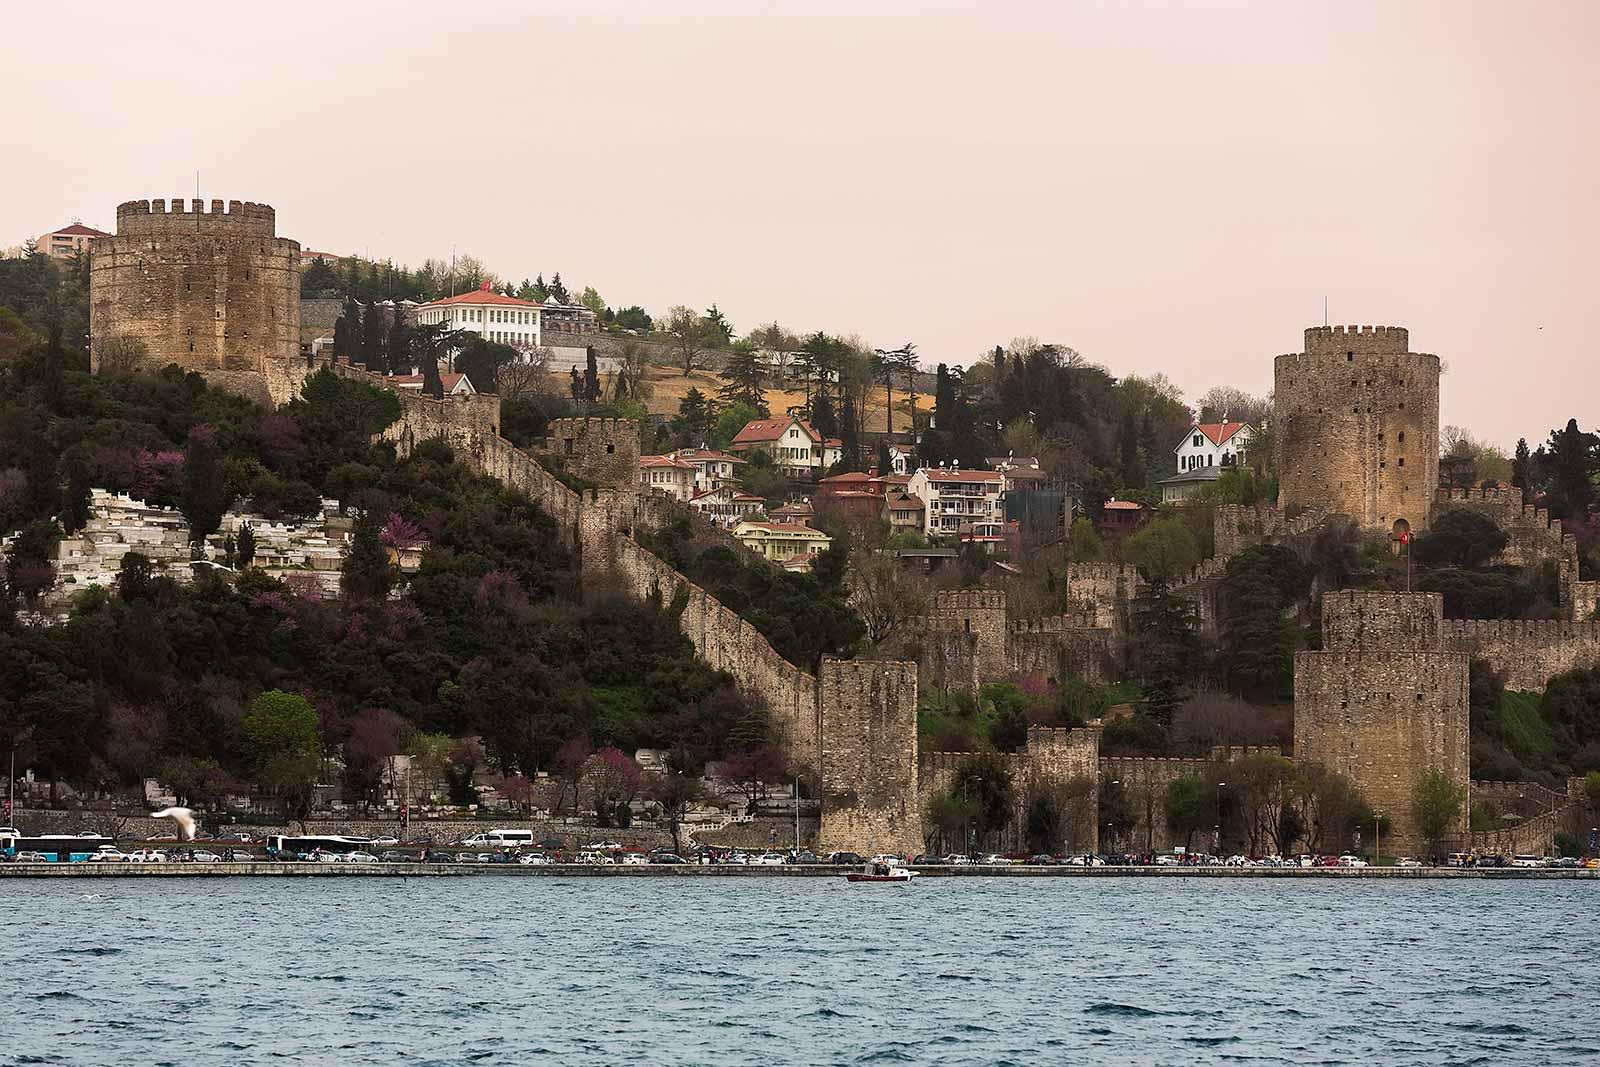 bosphorus-rumeli-hisari-istanbul-turkey